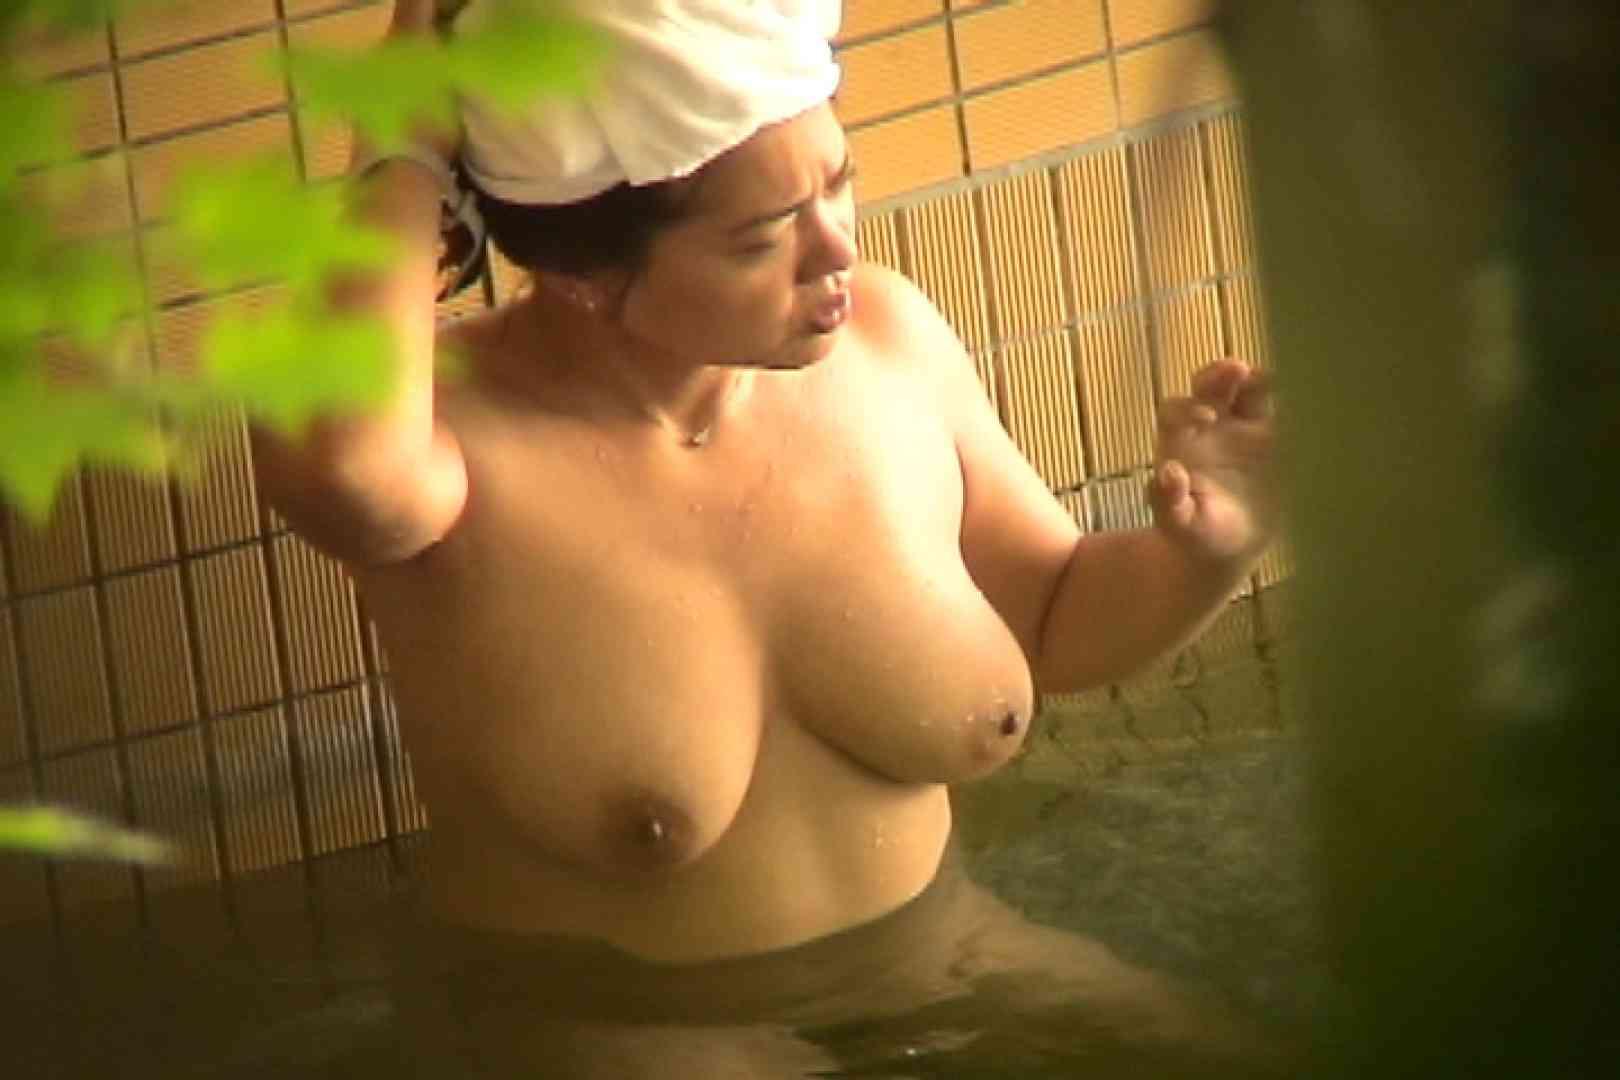 Aquaな露天風呂Vol.449 エッチな盗撮  93pic 80